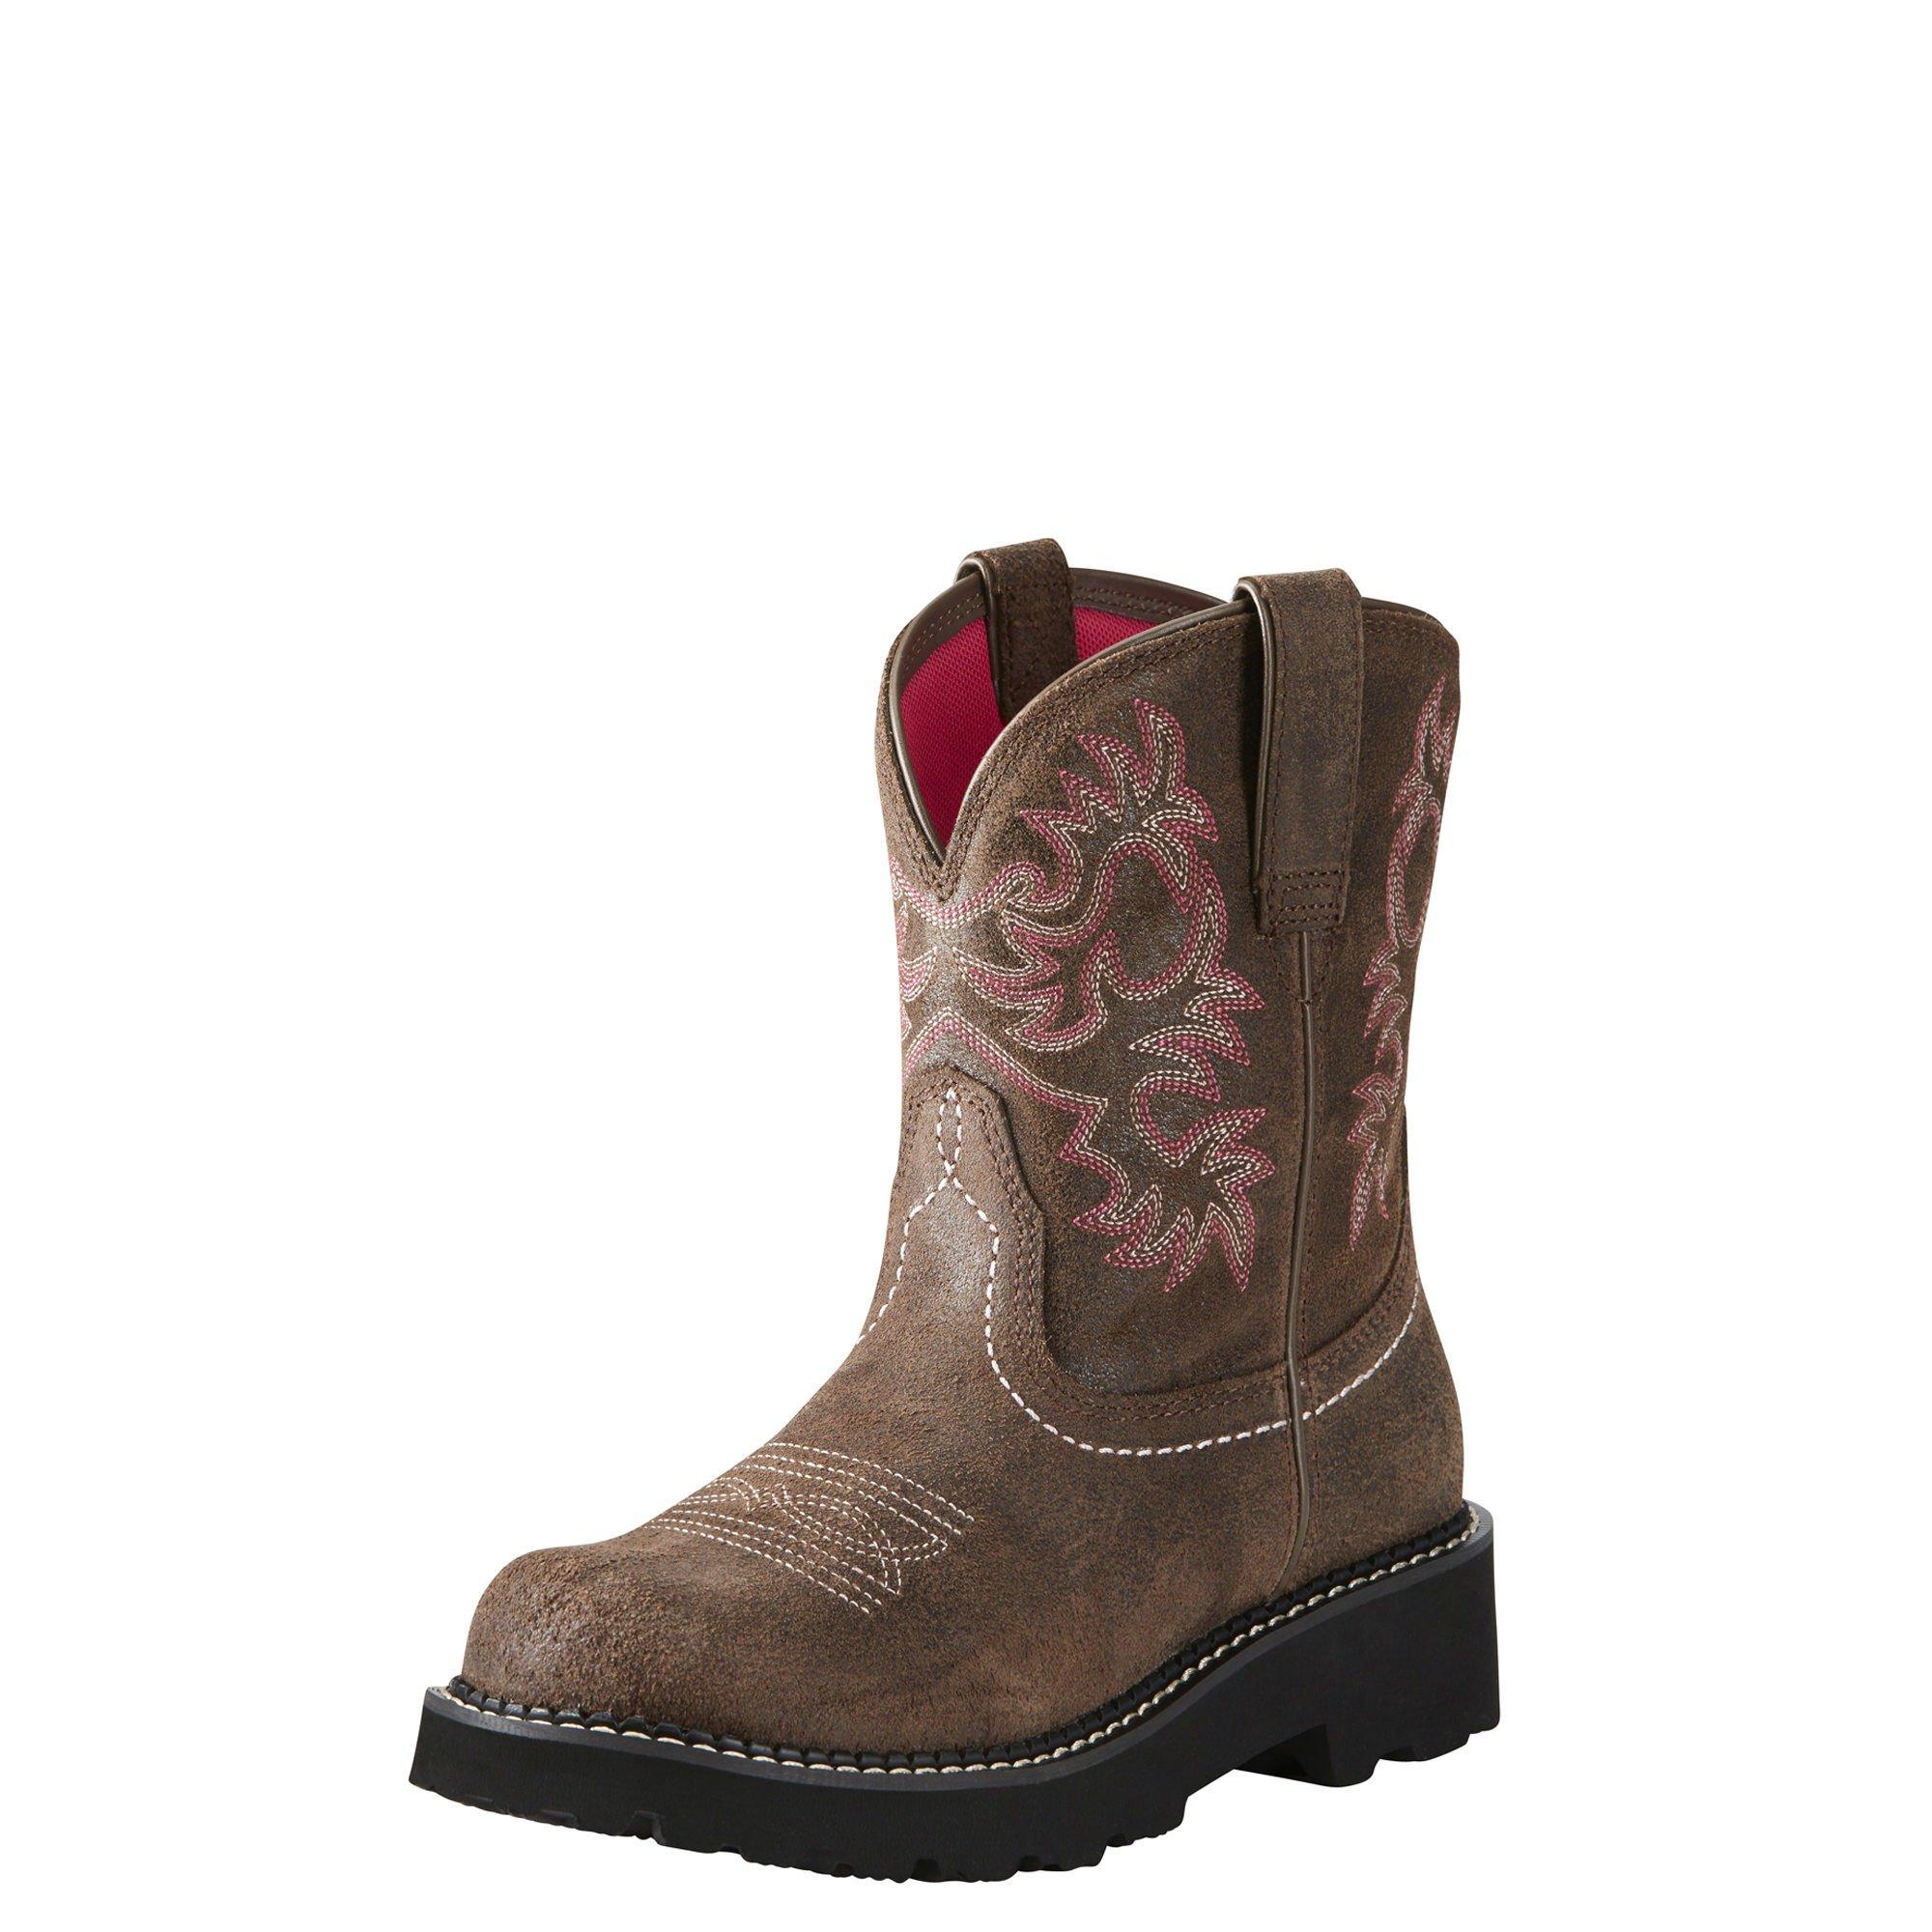 ARIAT WOMEN Fatbaby Collection Western Cowboy Boot, Dark Barley, 6 B US by ARIAT WOMEN (Image #1)